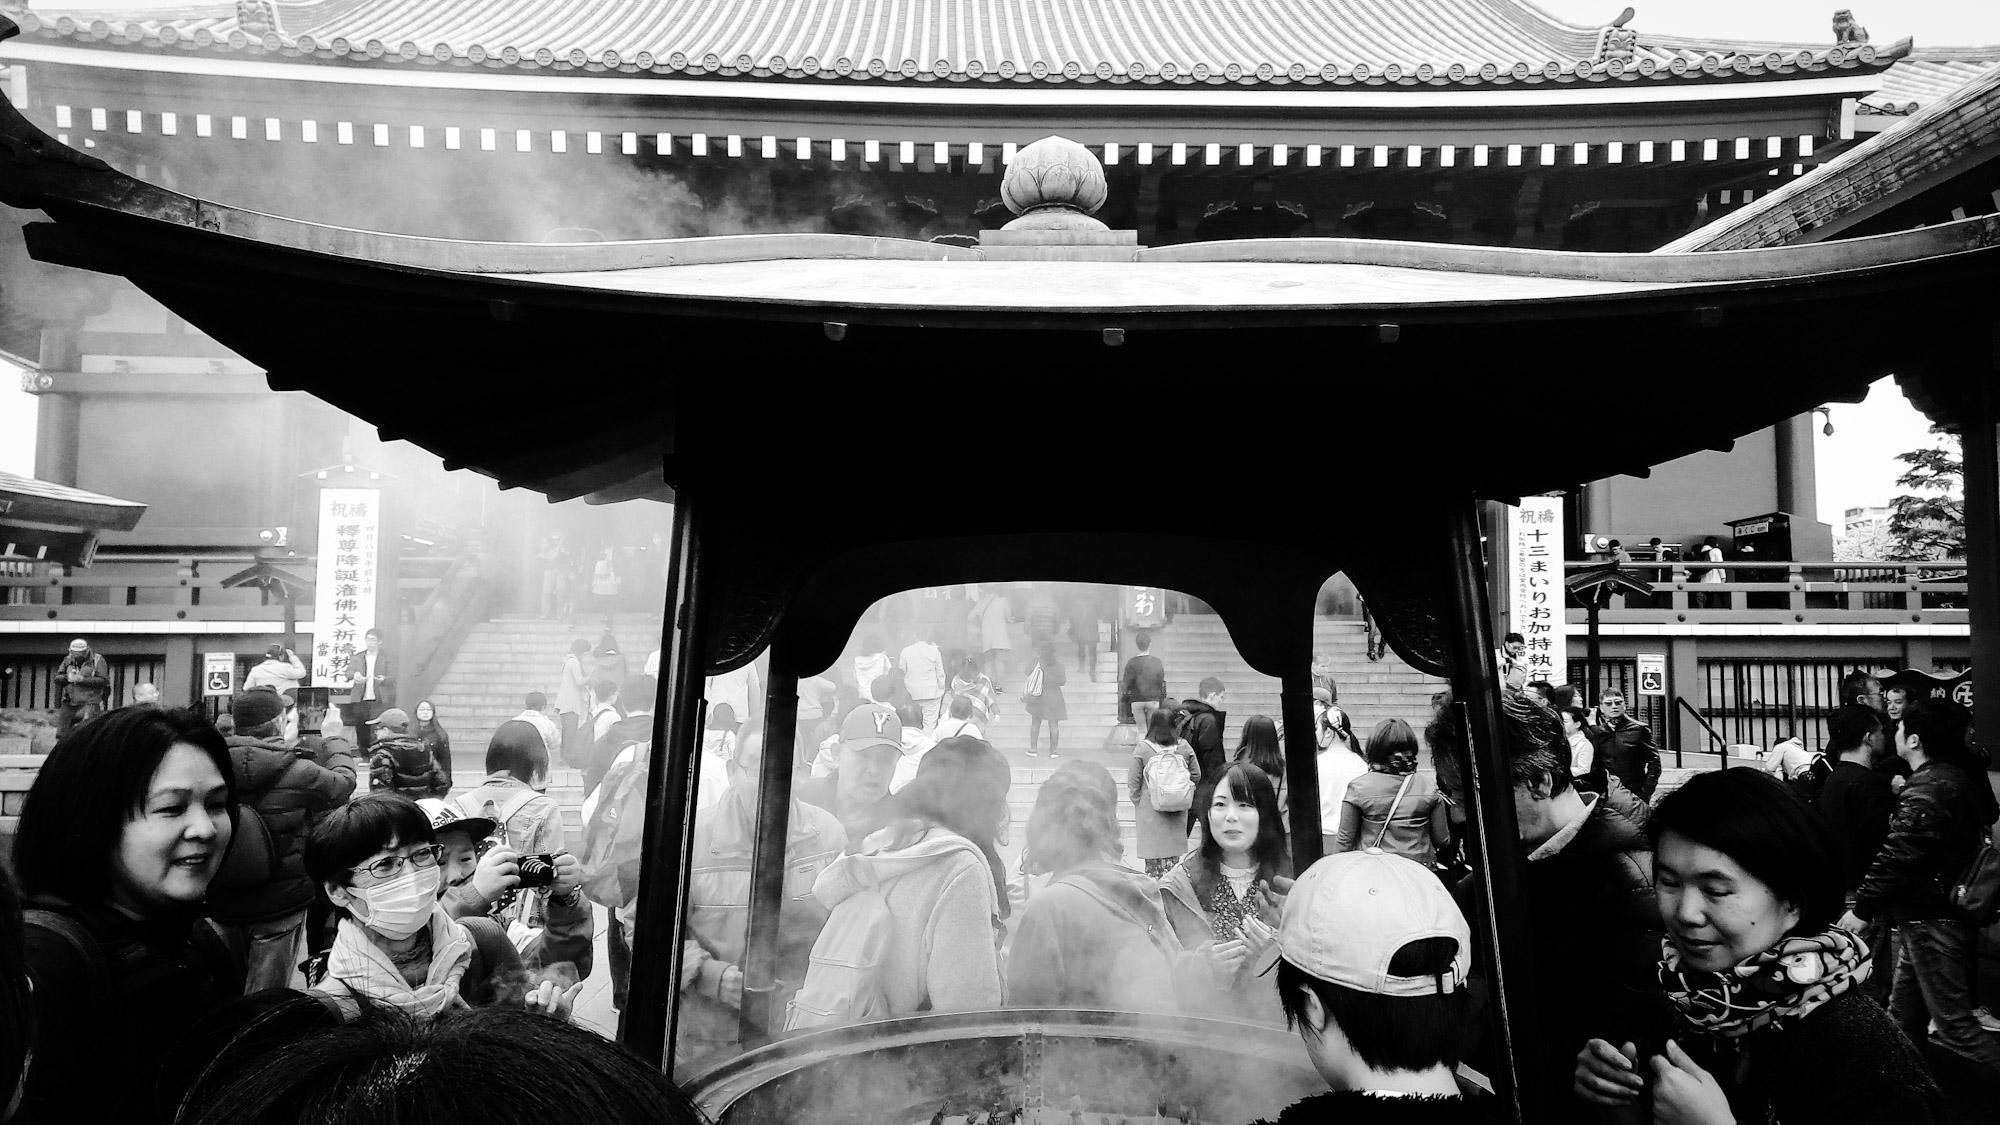 Urban photo – Asakusa, Tokyo, Japan. 'Senso-ji Temple 3.' Complete image from my recent travel art blog article 'Sakura Japan.' Now online - sketchbookexplorer.com @davidasutton @sketchbookexplorer Facebook.com/davidanthonysutton #photography #japan #tokyo #sakura #sensojitemple #buddhism #travel #travelblog #cherryblossom #cherryblossomseason #cherryblossomjapan